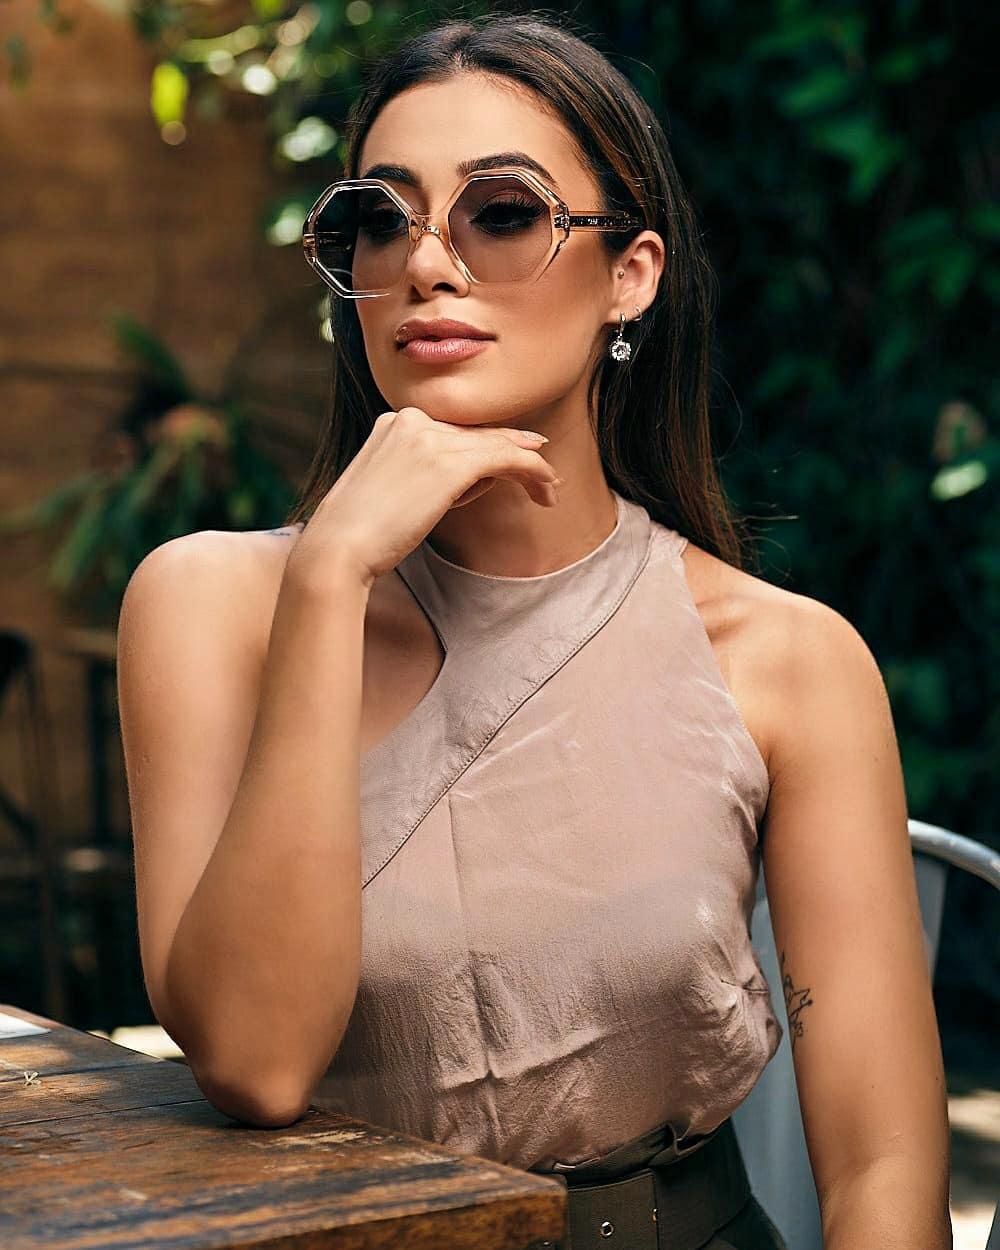 natalia gurgel, top model brasil 2021/miss morada nova 2019/miss sertao central empresarial 2018/top 20 de miss asia pacific international 2018, representando o uruguai. - Página 6 21373421